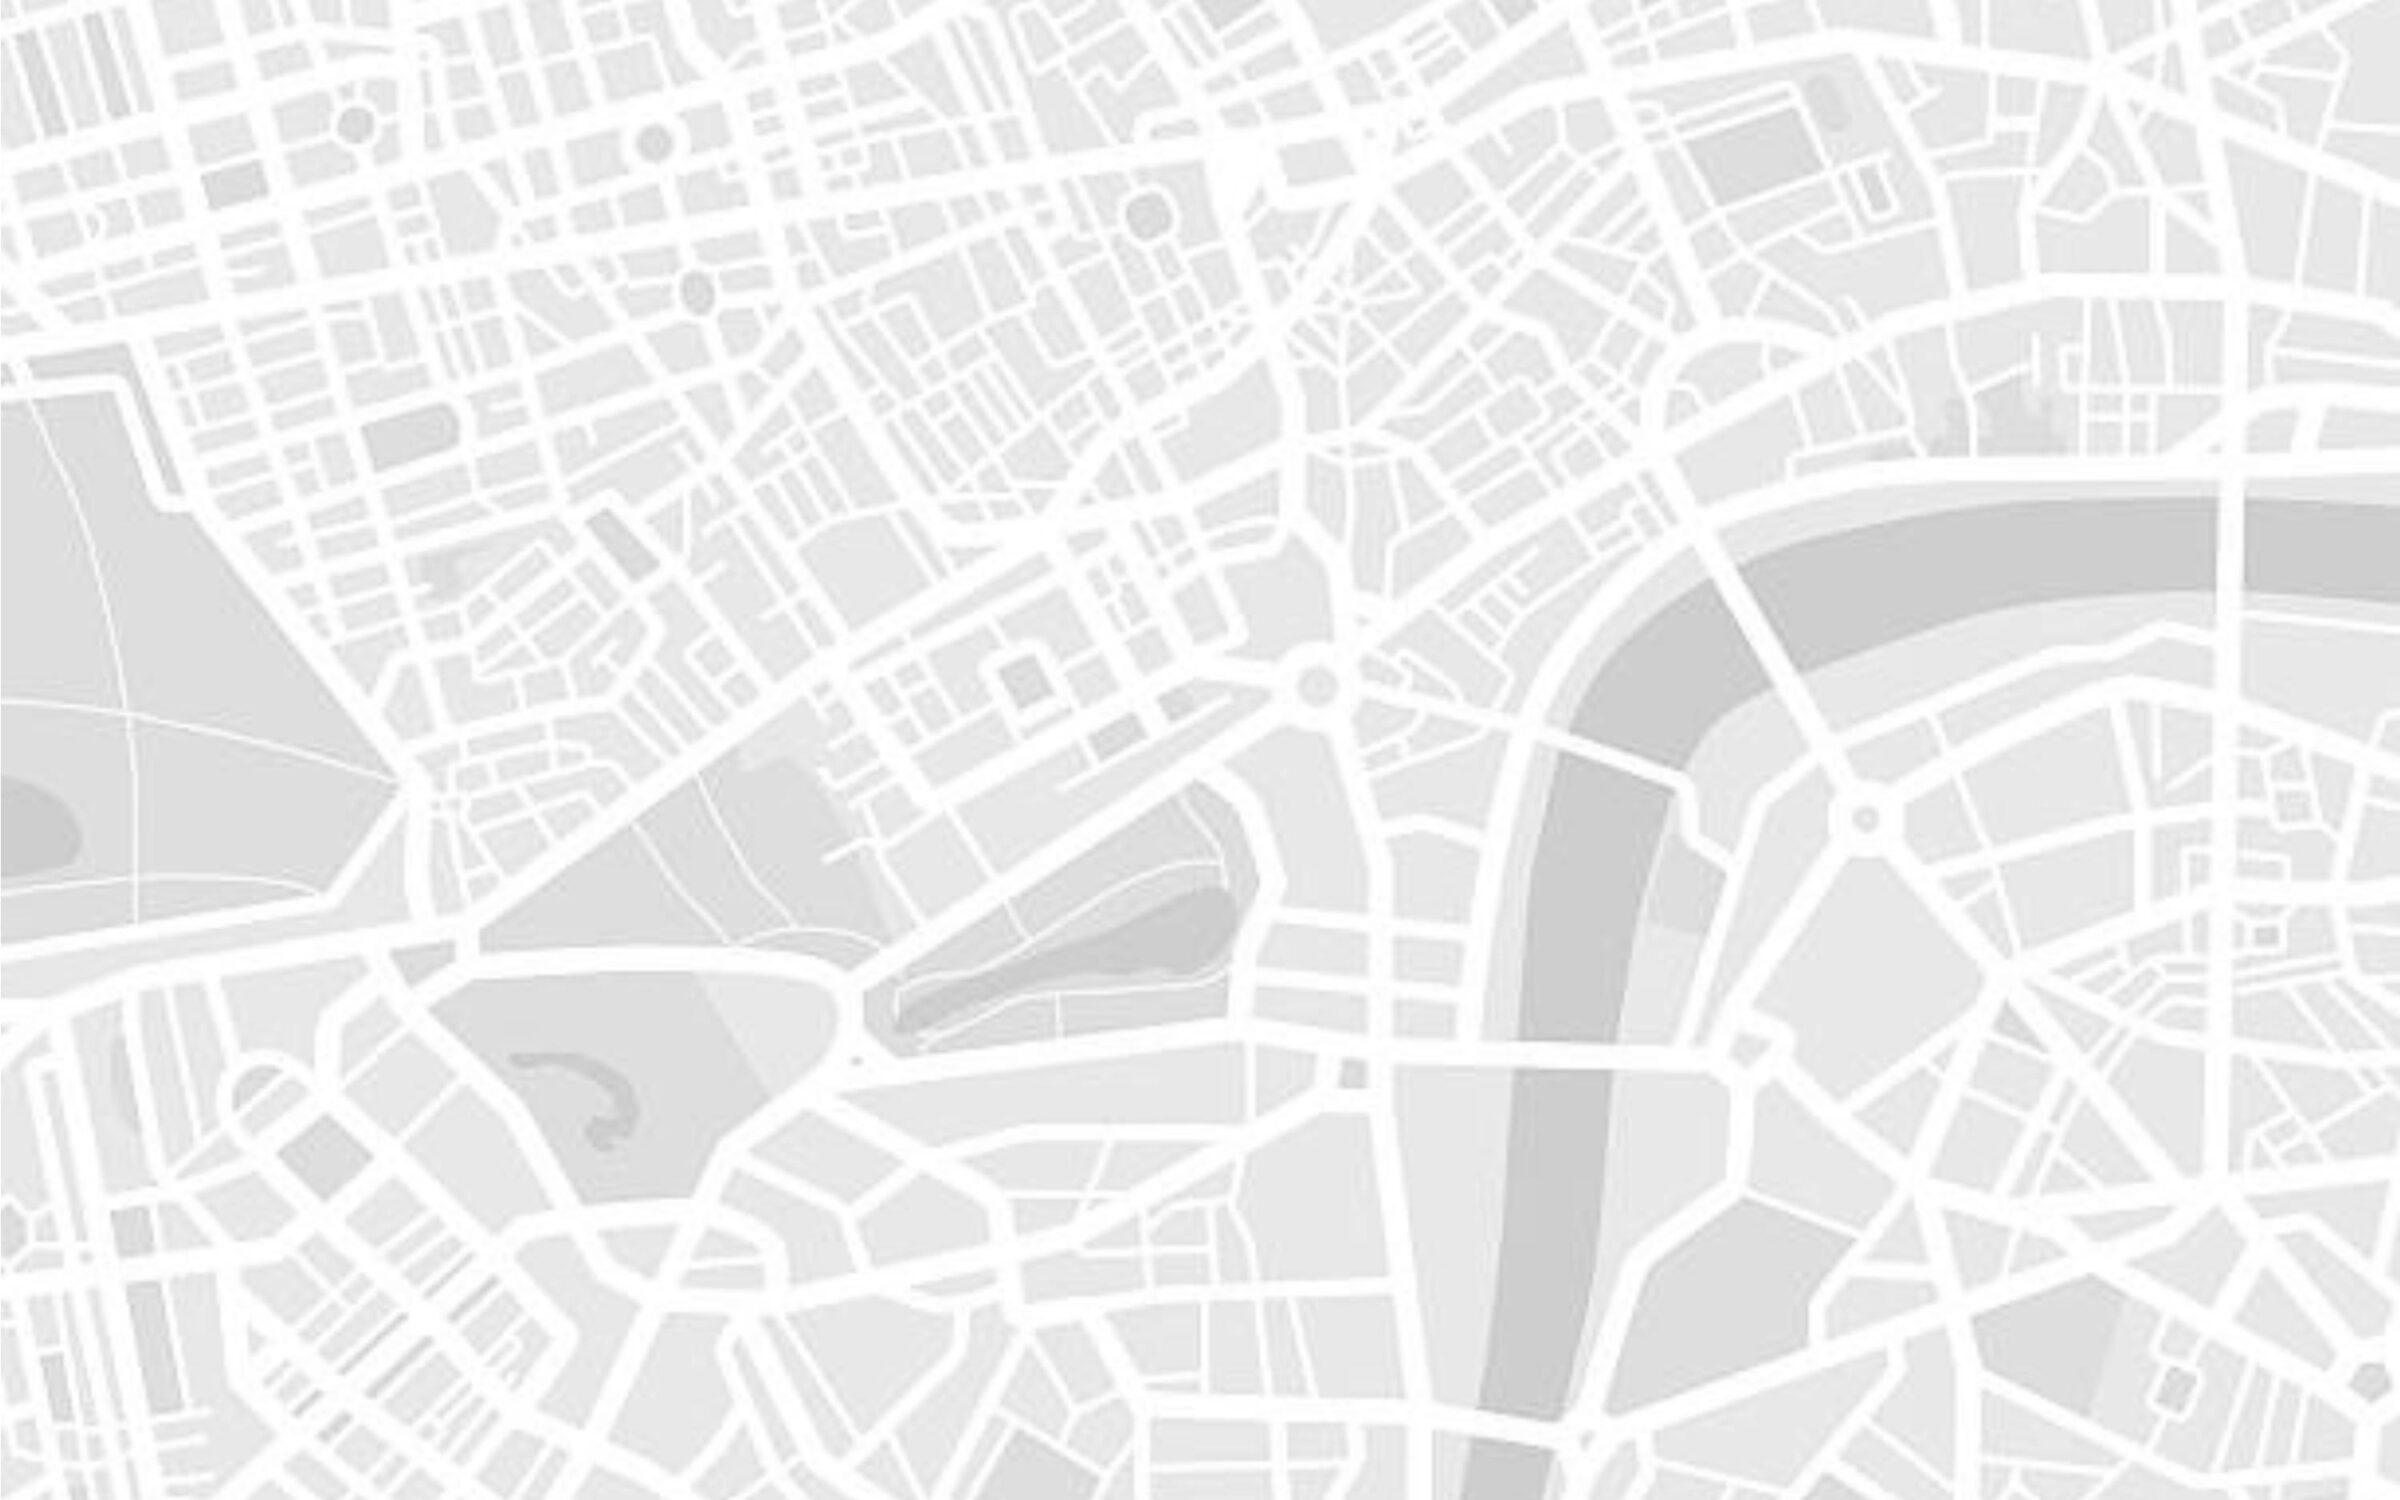 Map wireframe temp image